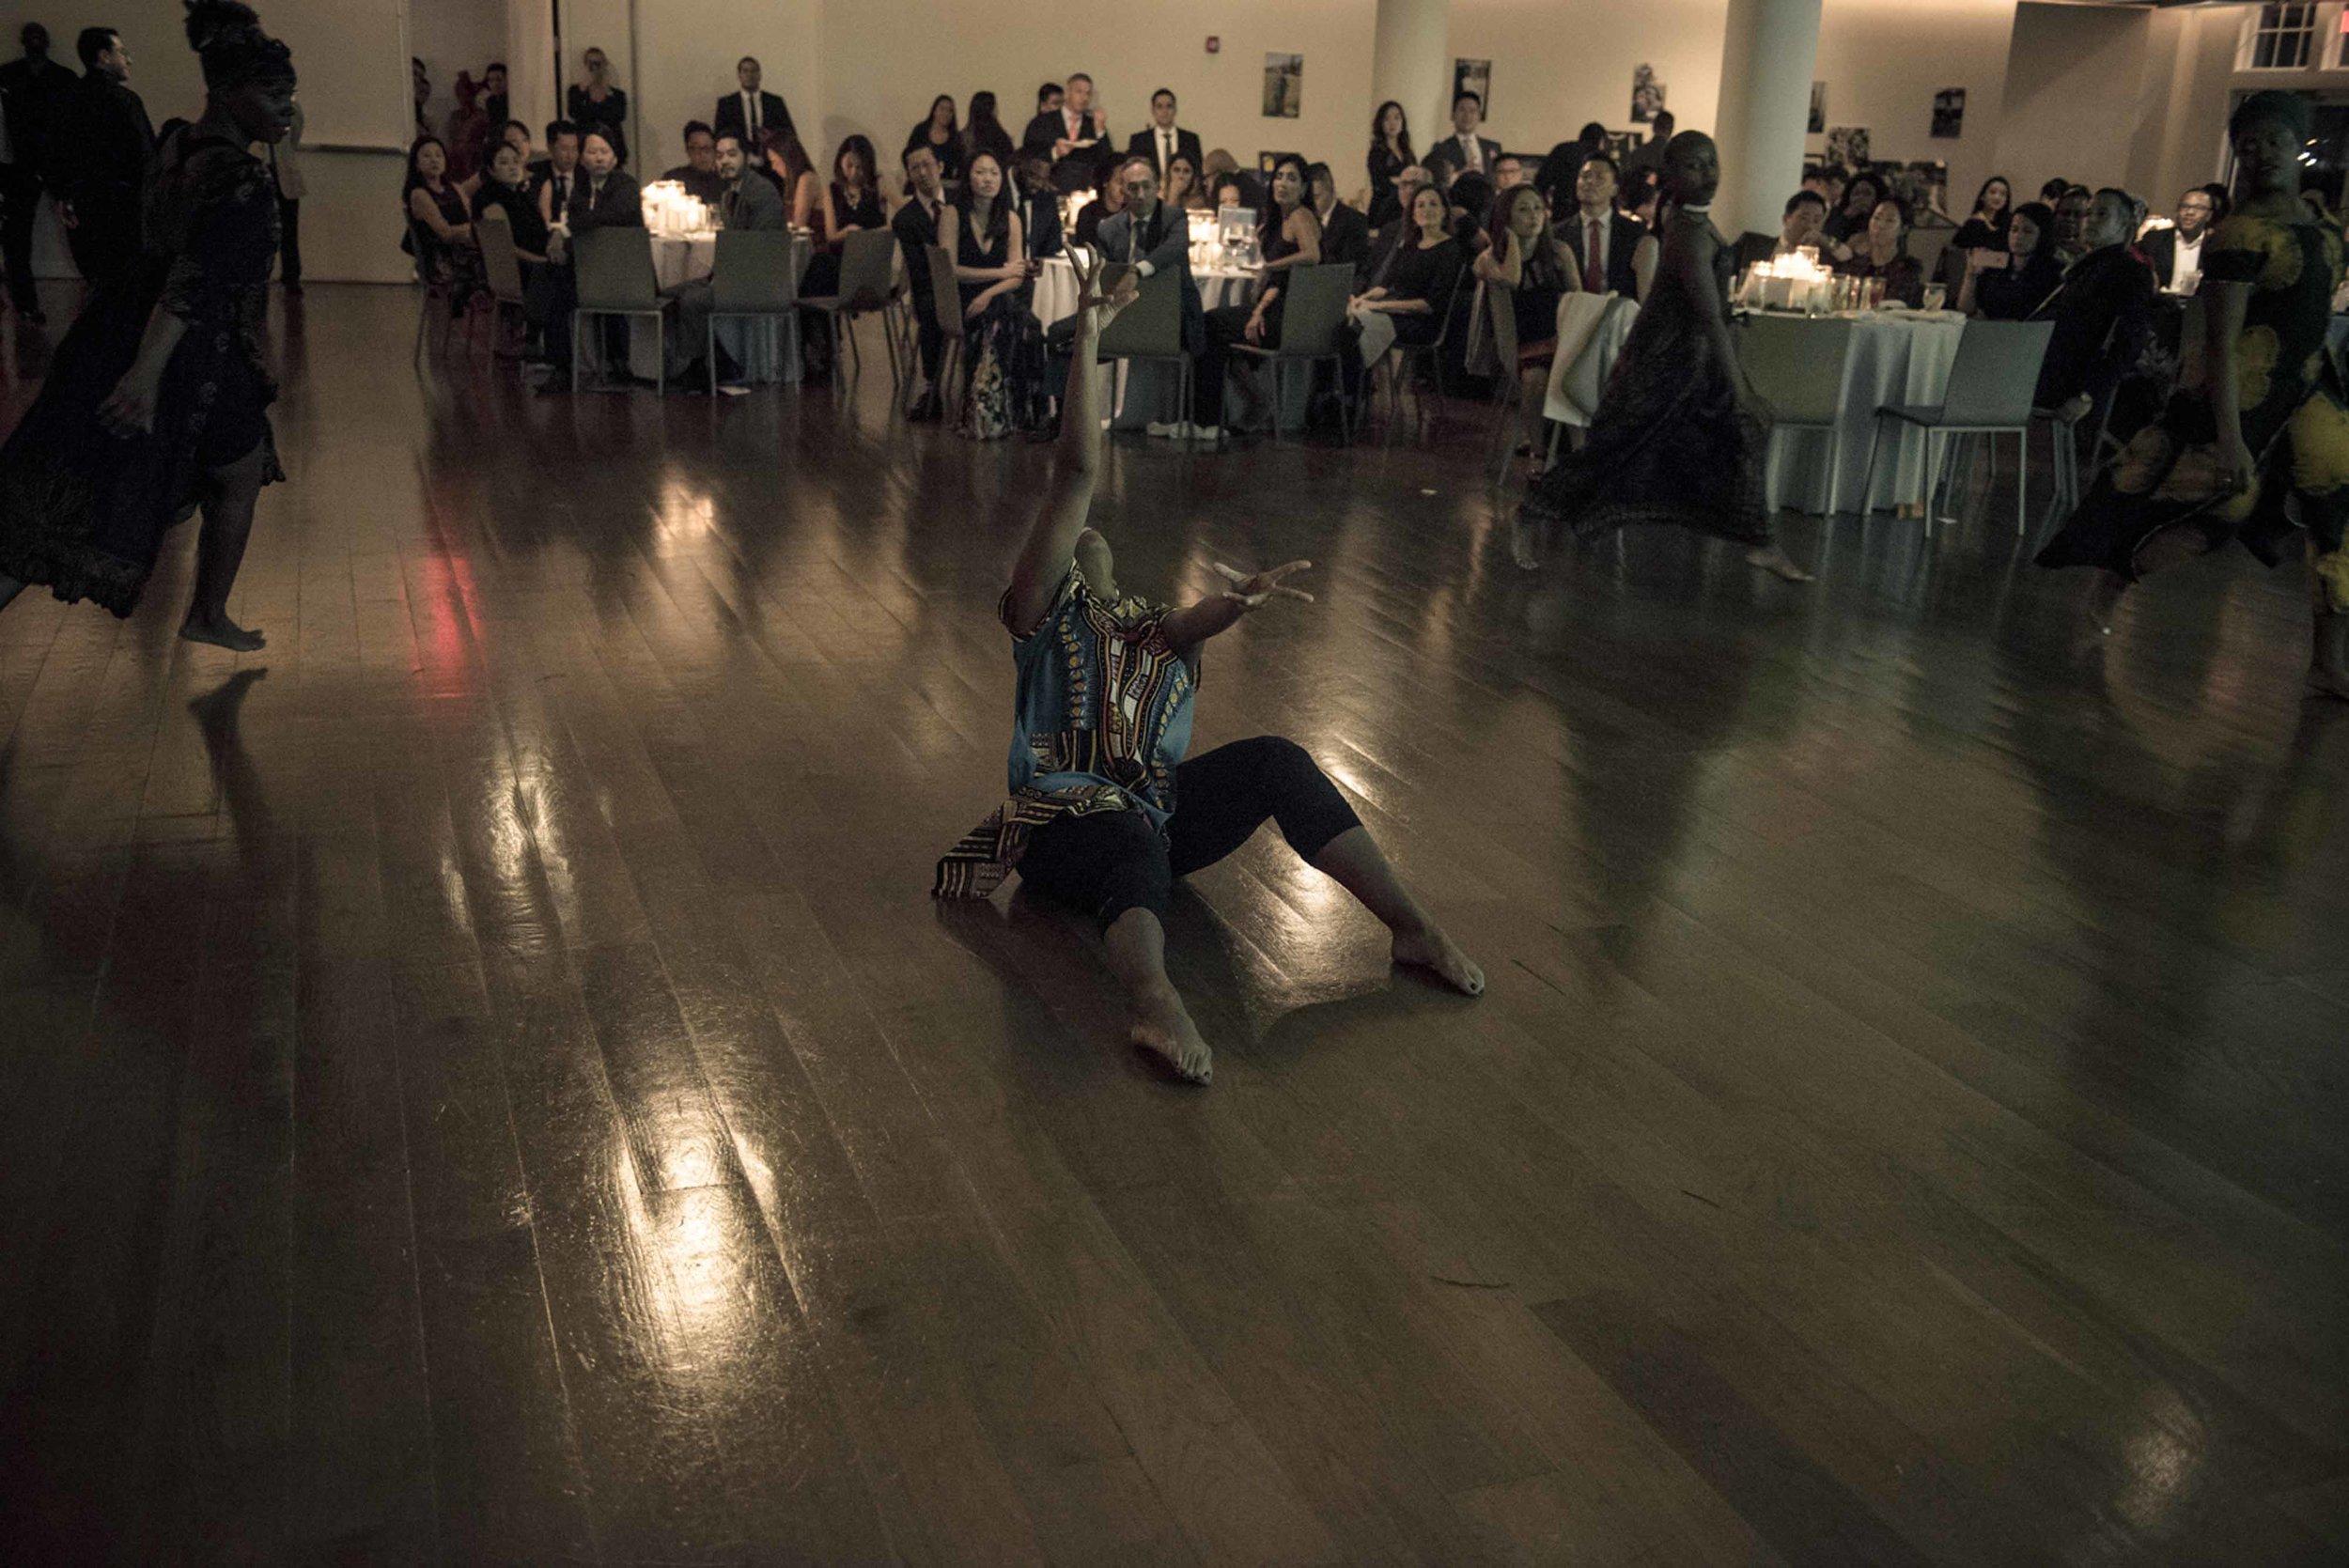 2017-10-21 Zimele USA 6th Annual Gala - Maritime Parc - Jersey City NJ_0267.jpg